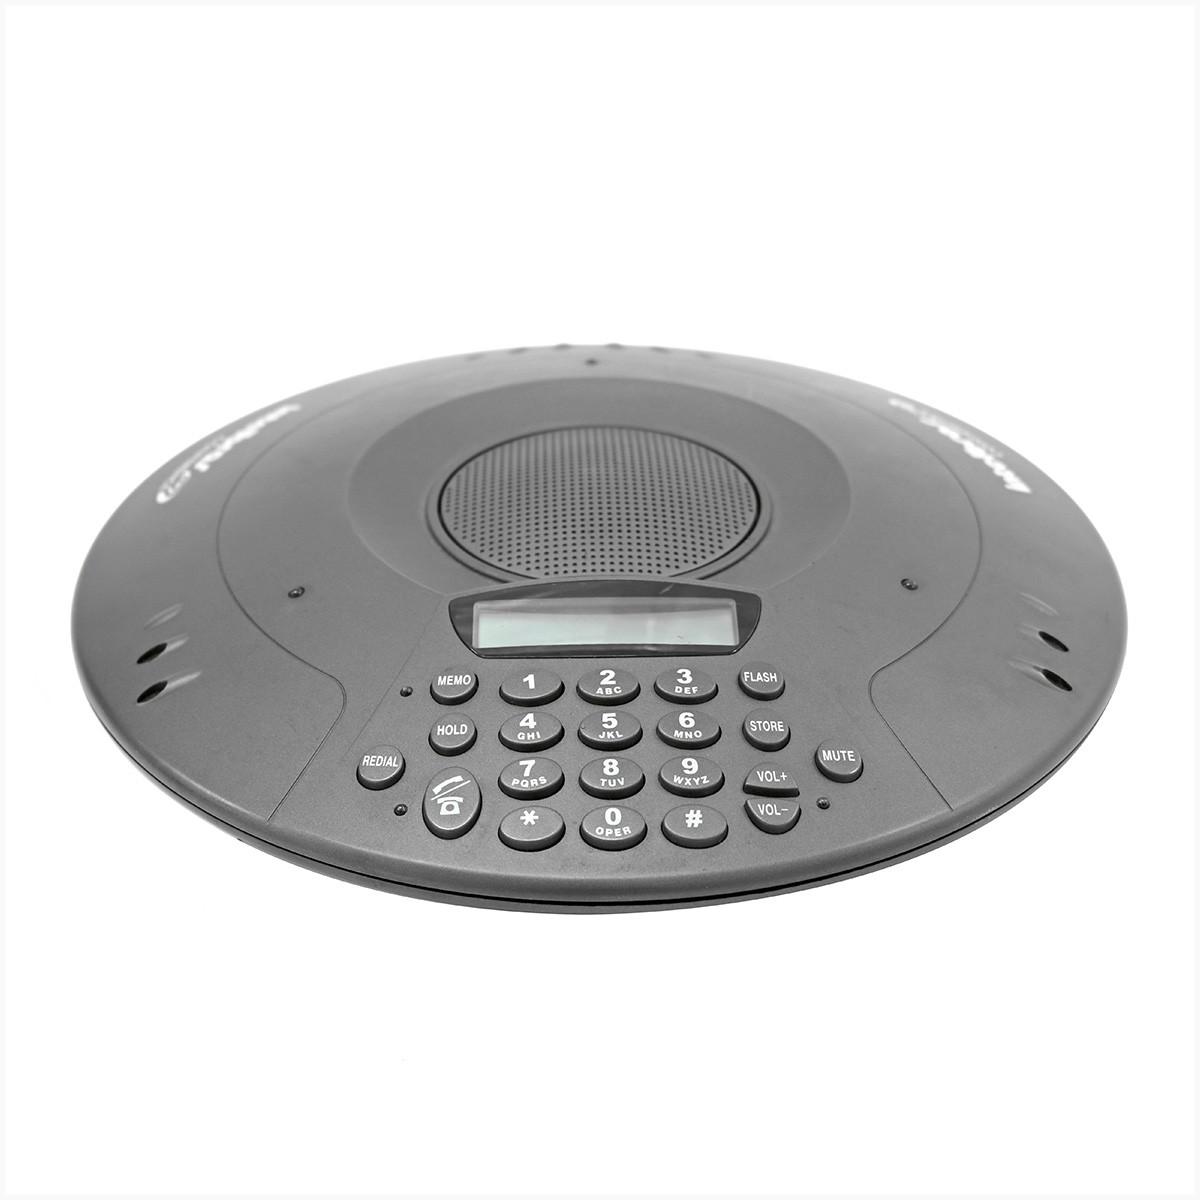 Telefone de Audioconferência Intelbras Conference - Usado